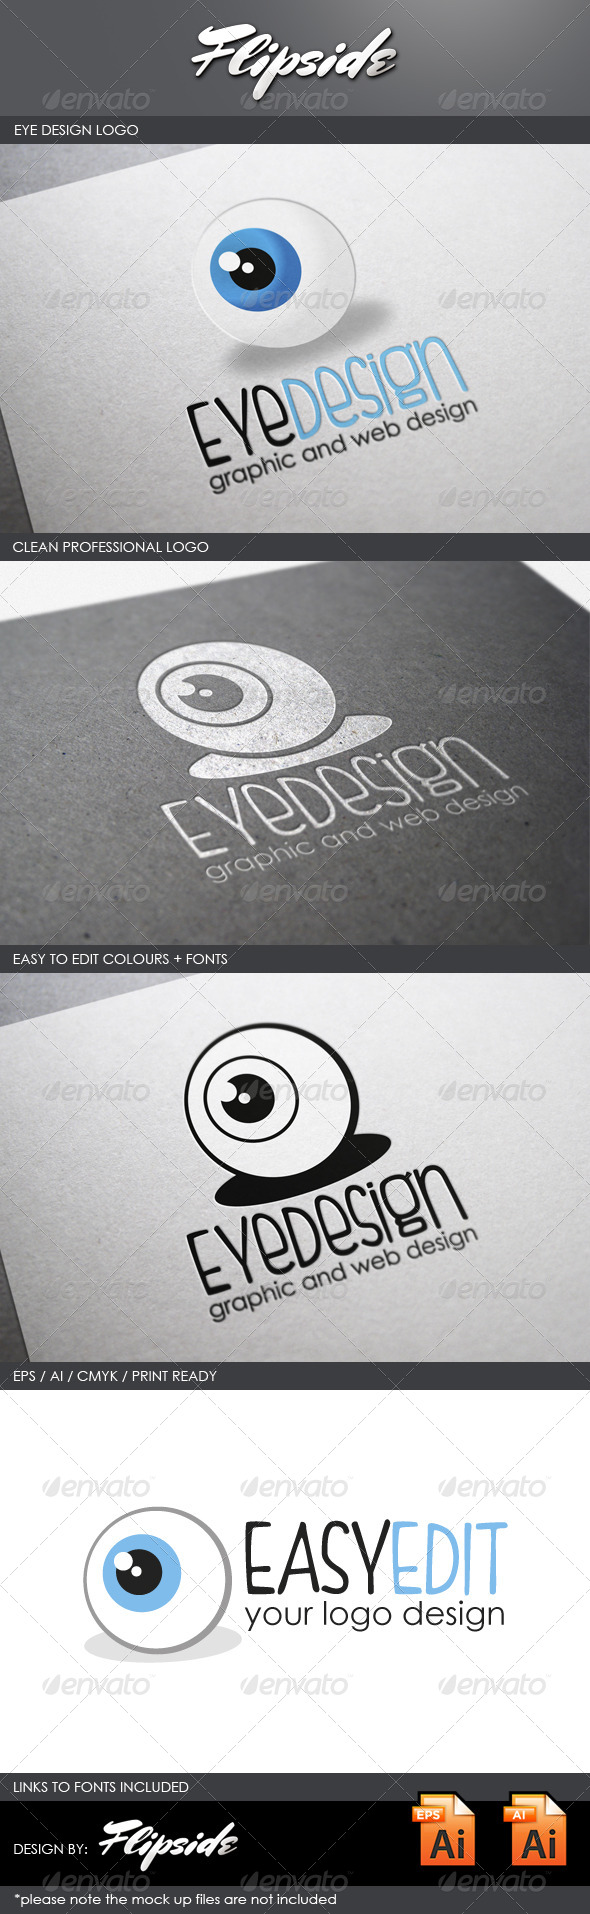 GraphicRiver Eye Design Logo 4327422